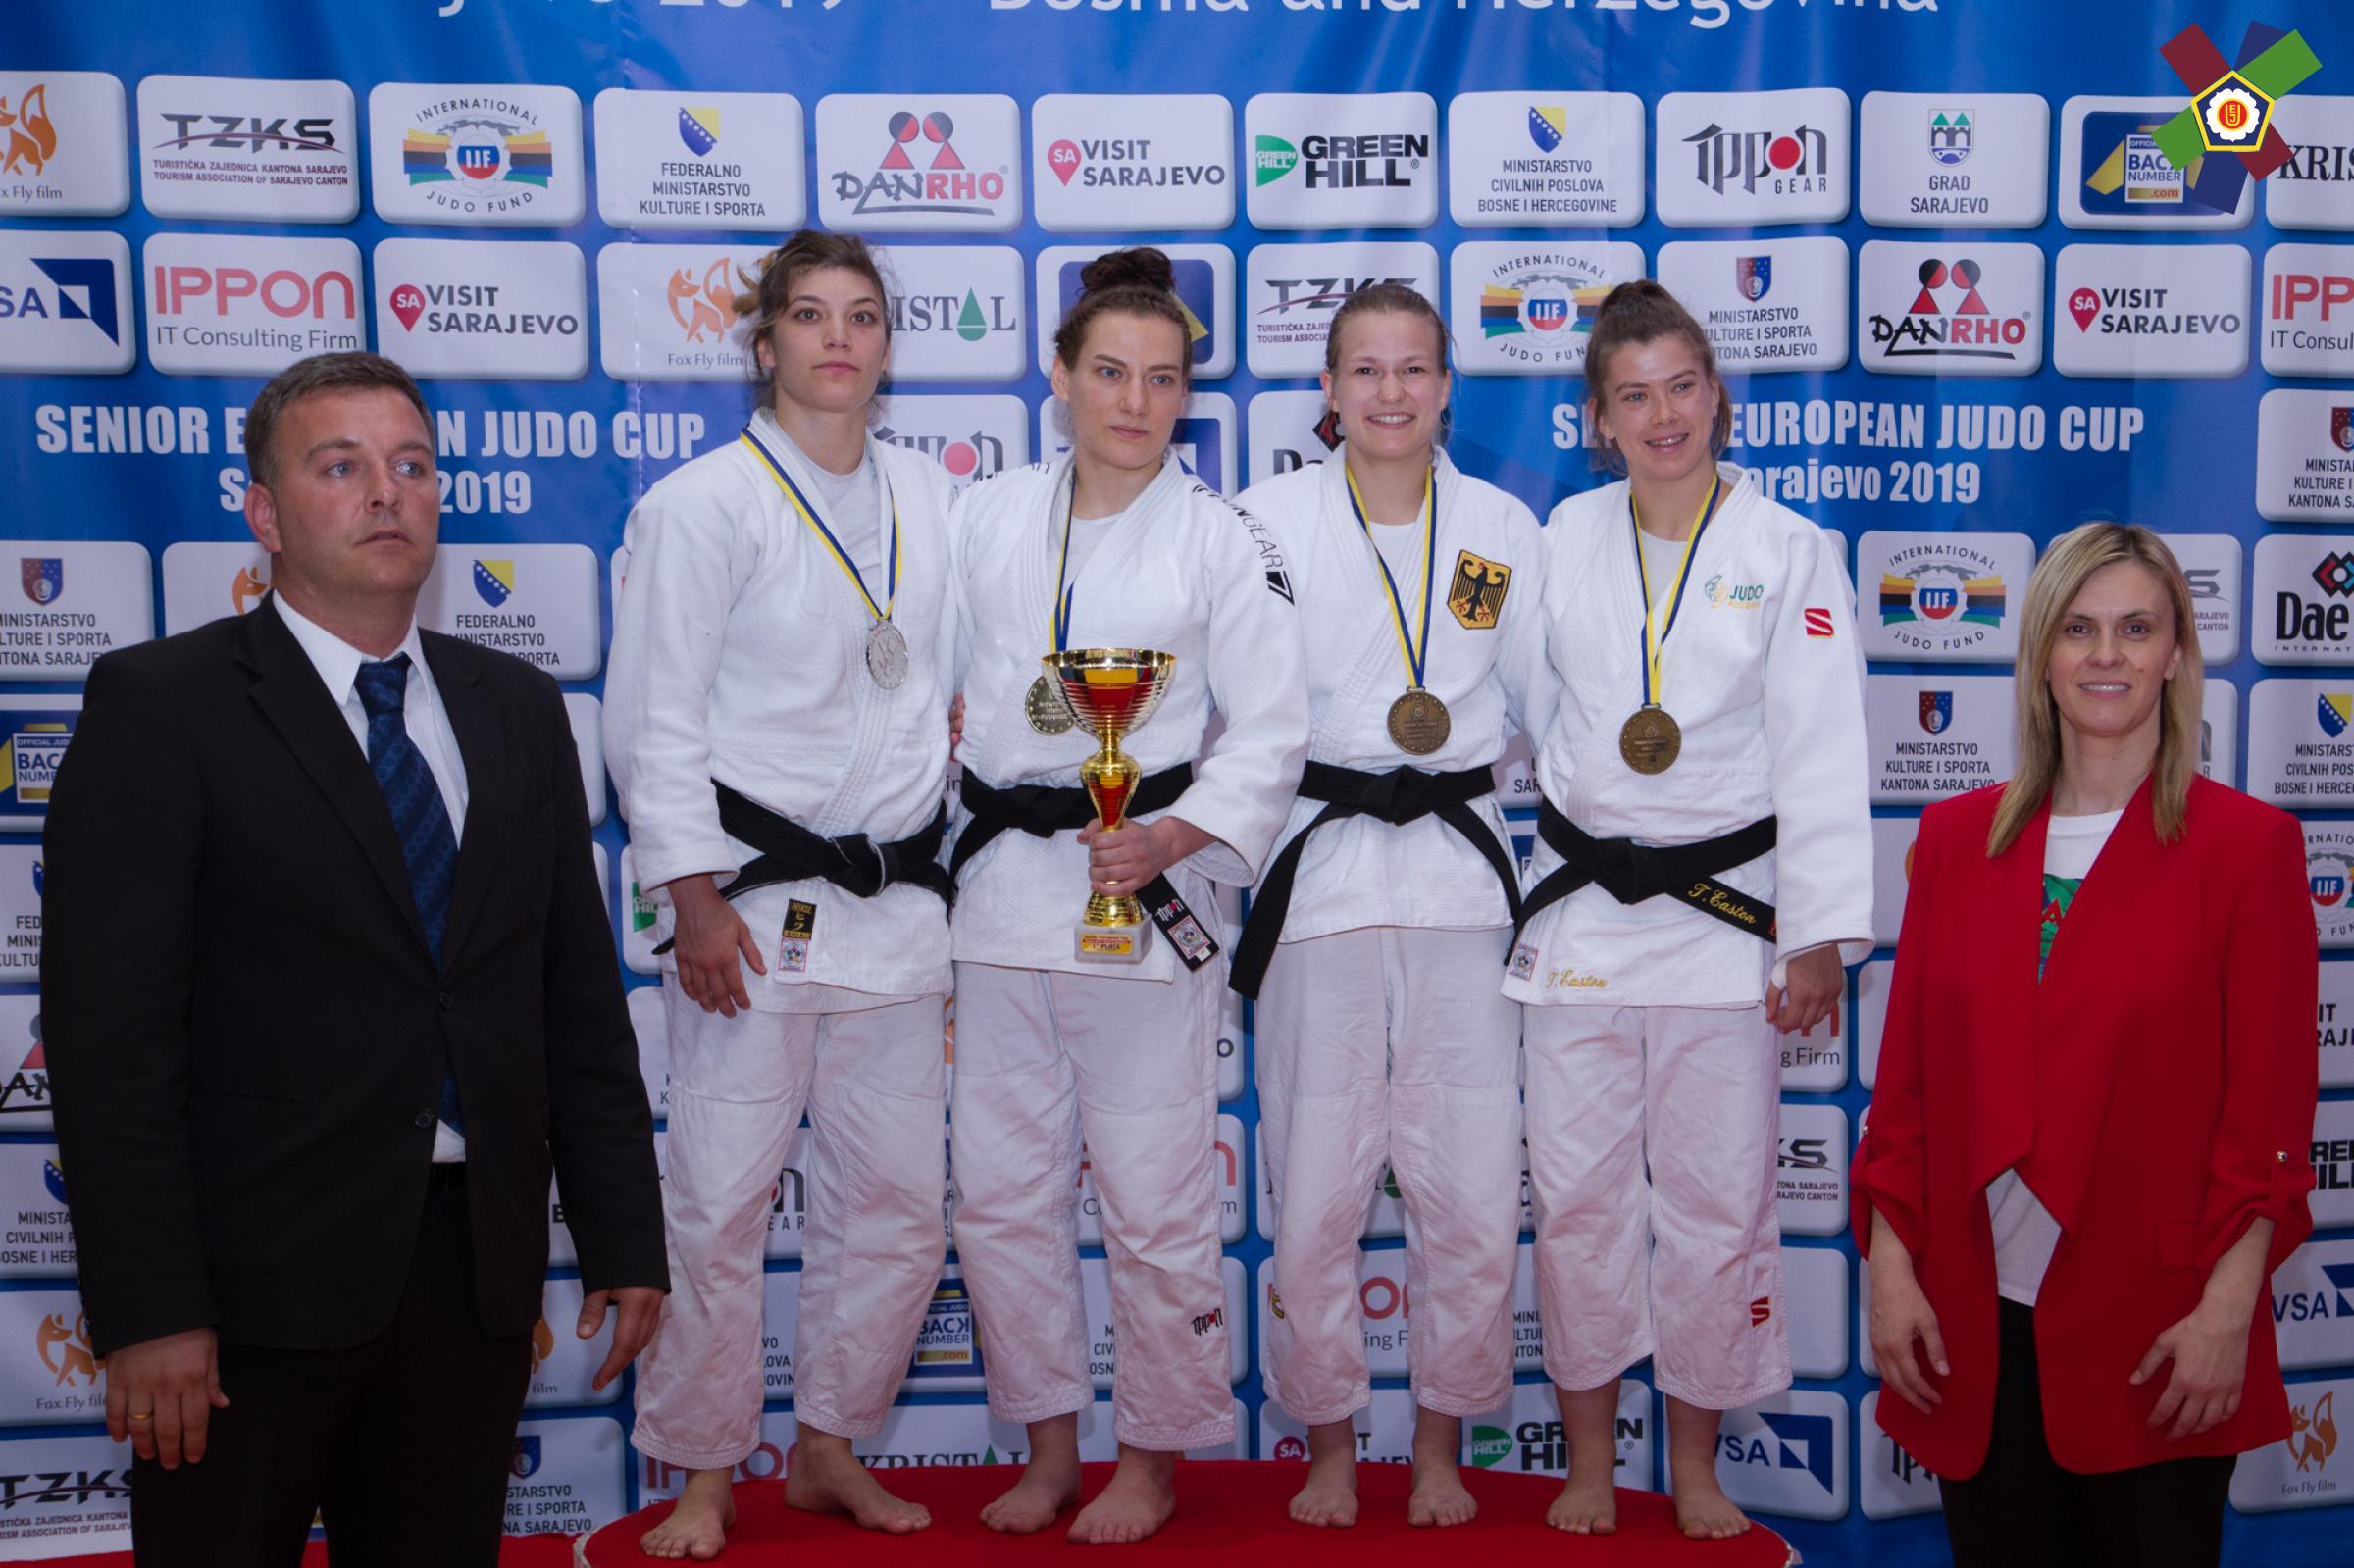 Judo-Senior-European-cup-Sarajevo-Bosnia-2019-KNETIG-Emoke-Hungary-52-kg-1